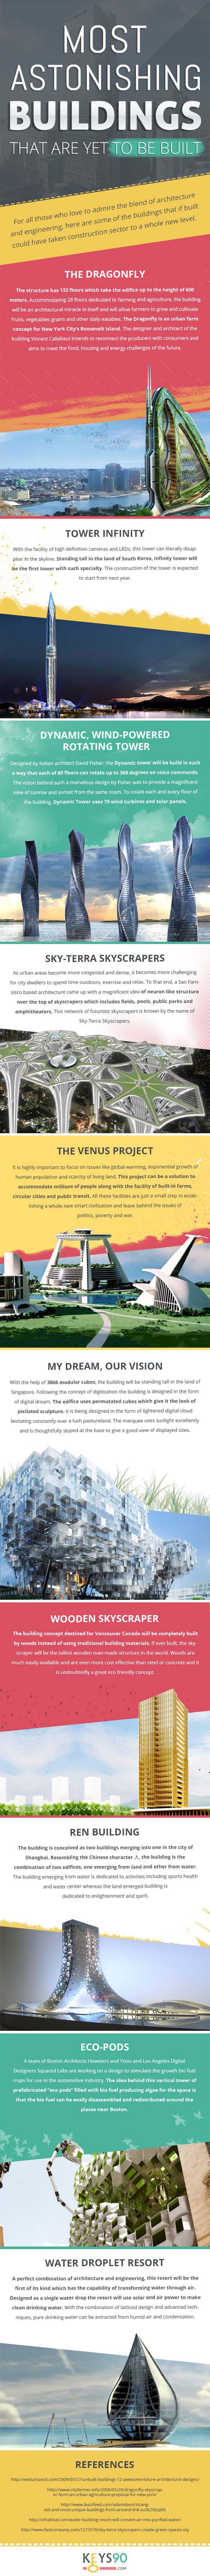 Astonishing buildings infographic